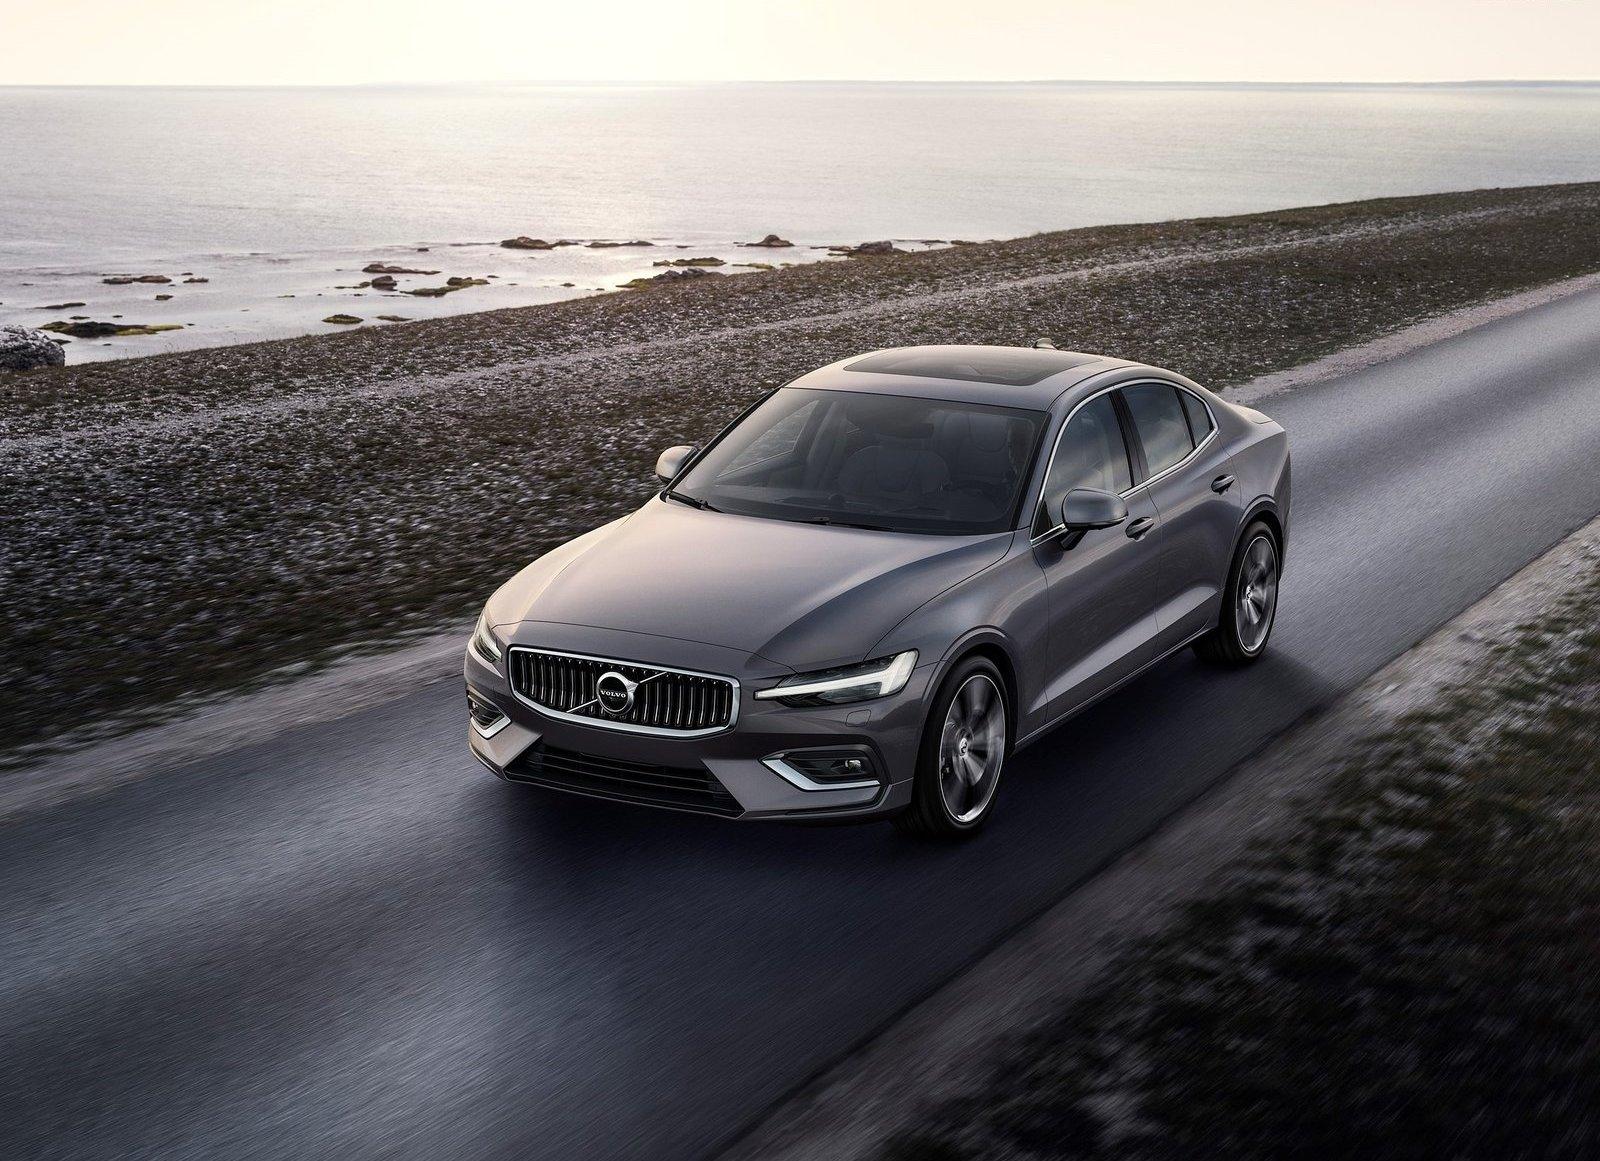 2019 Volvo S60 gray road